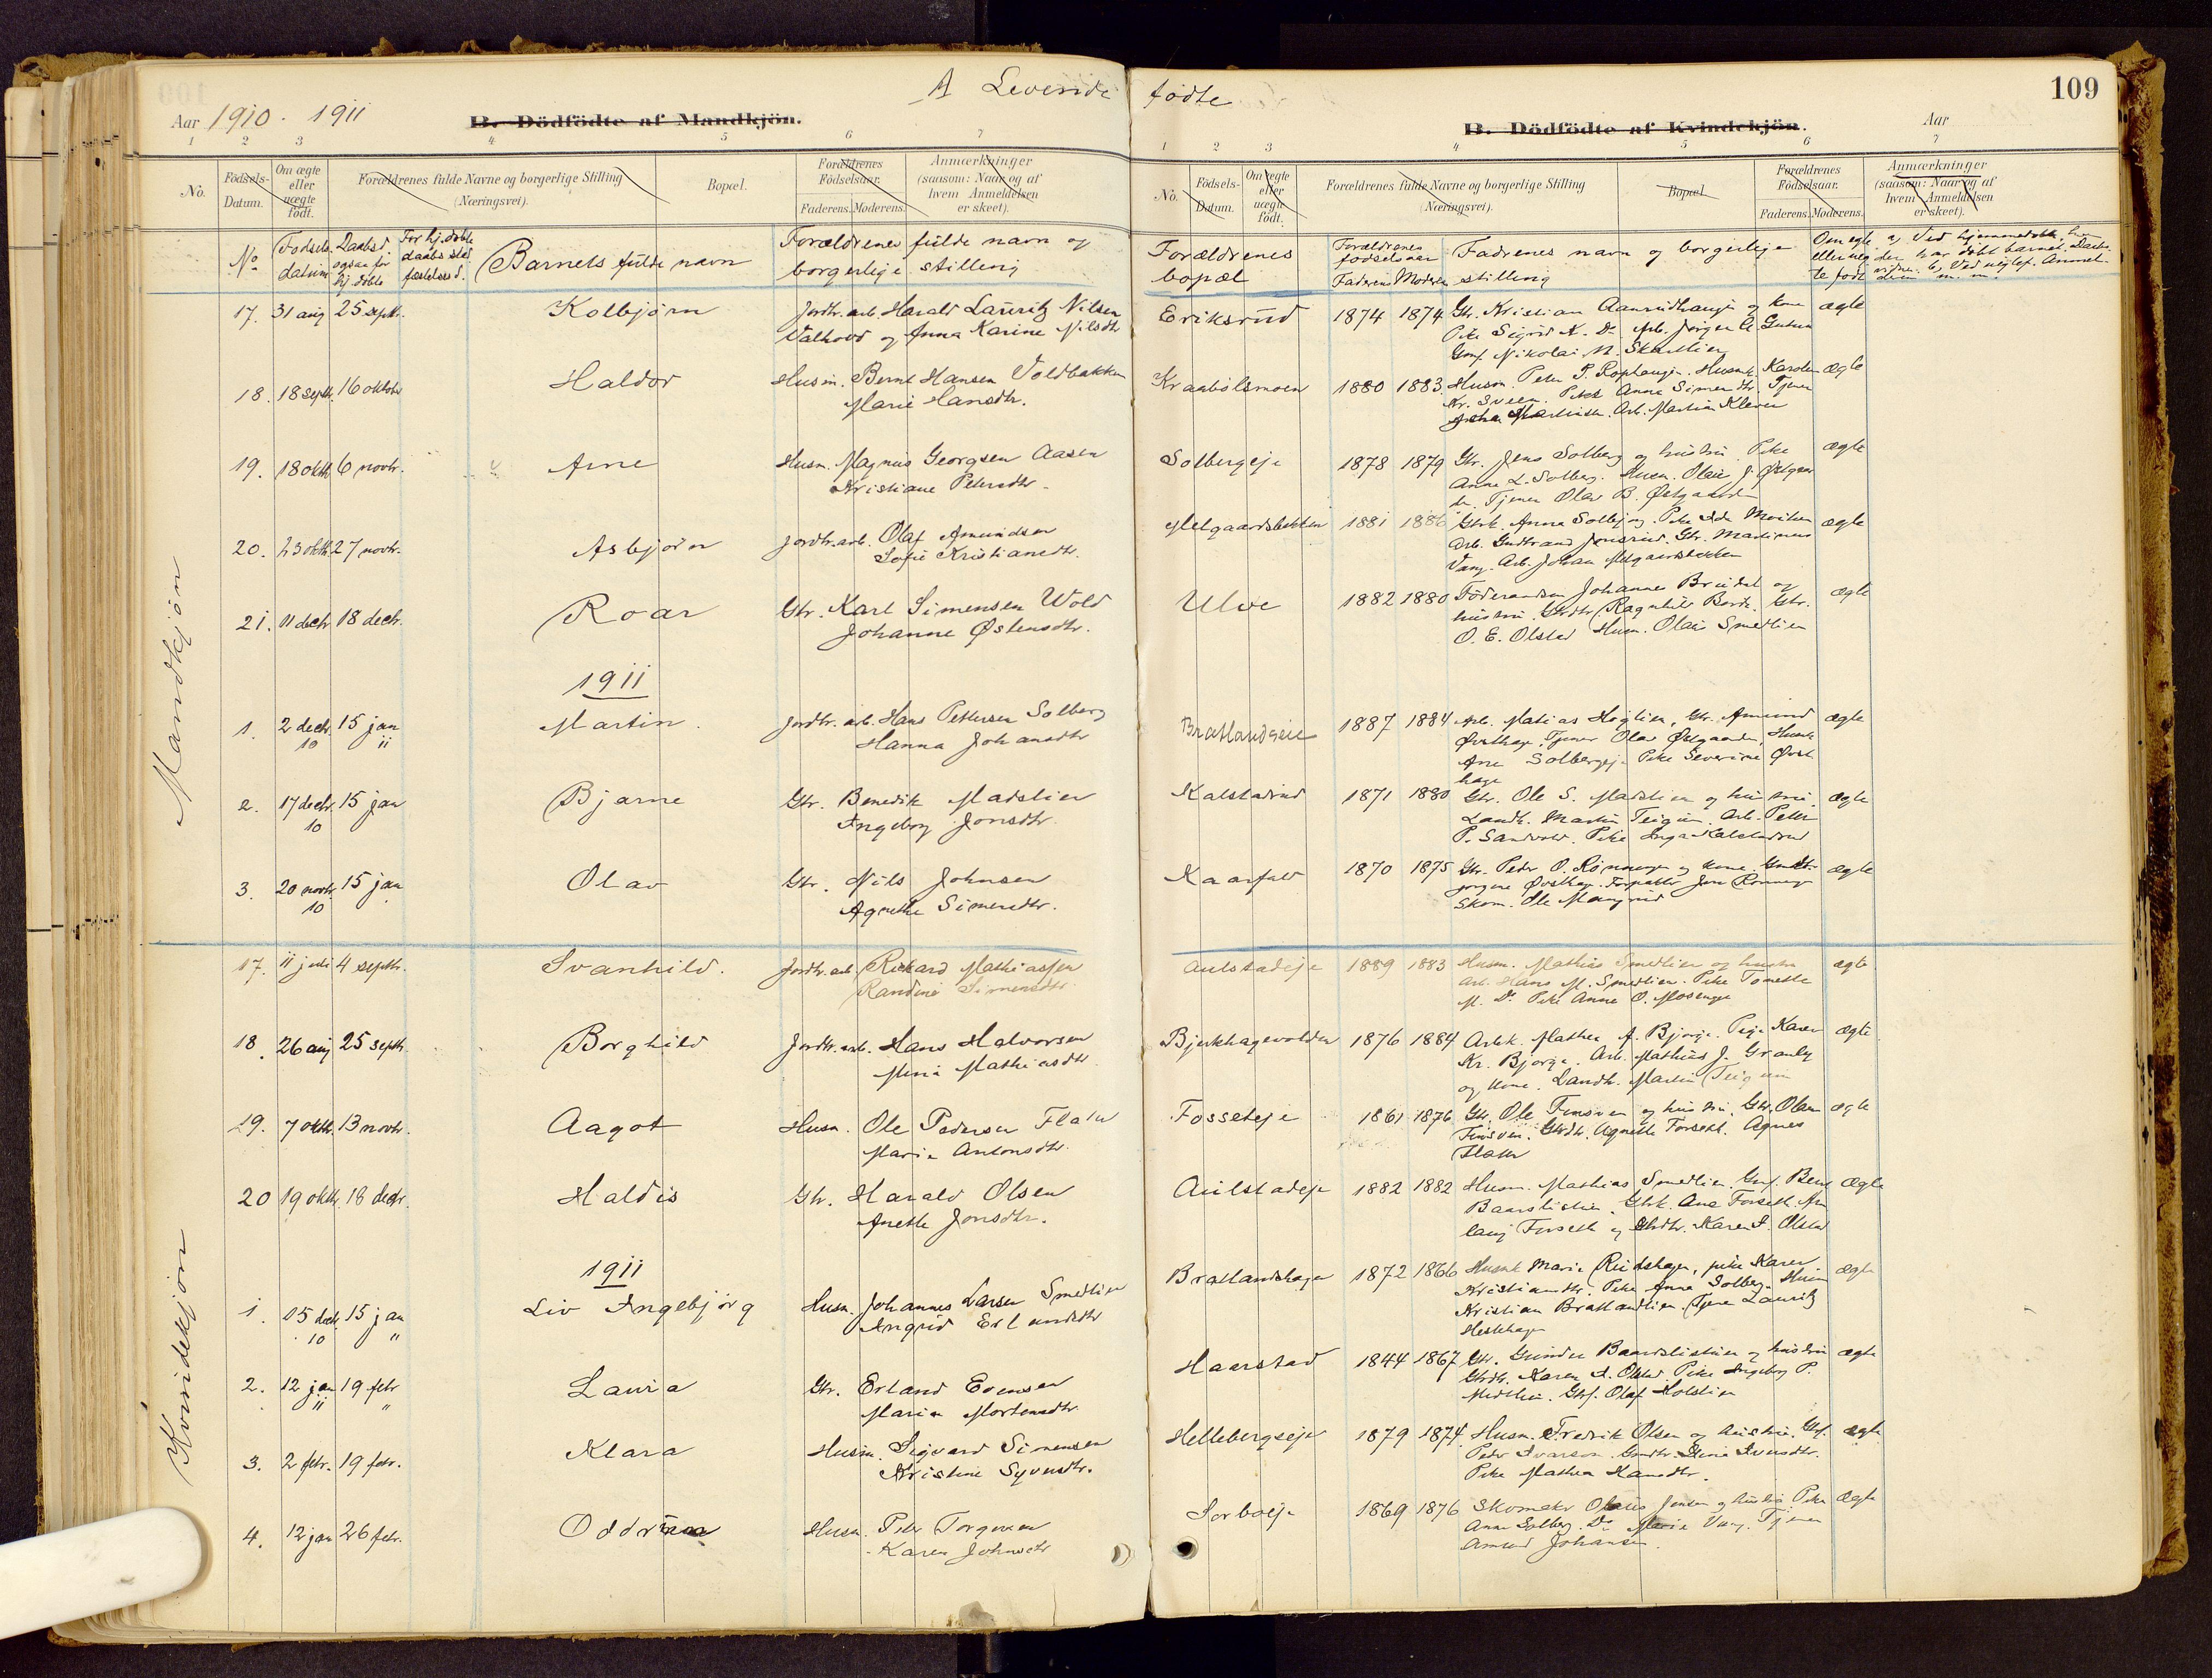 SAH, Vestre Gausdal prestekontor, Ministerialbok nr. 1, 1887-1914, s. 109